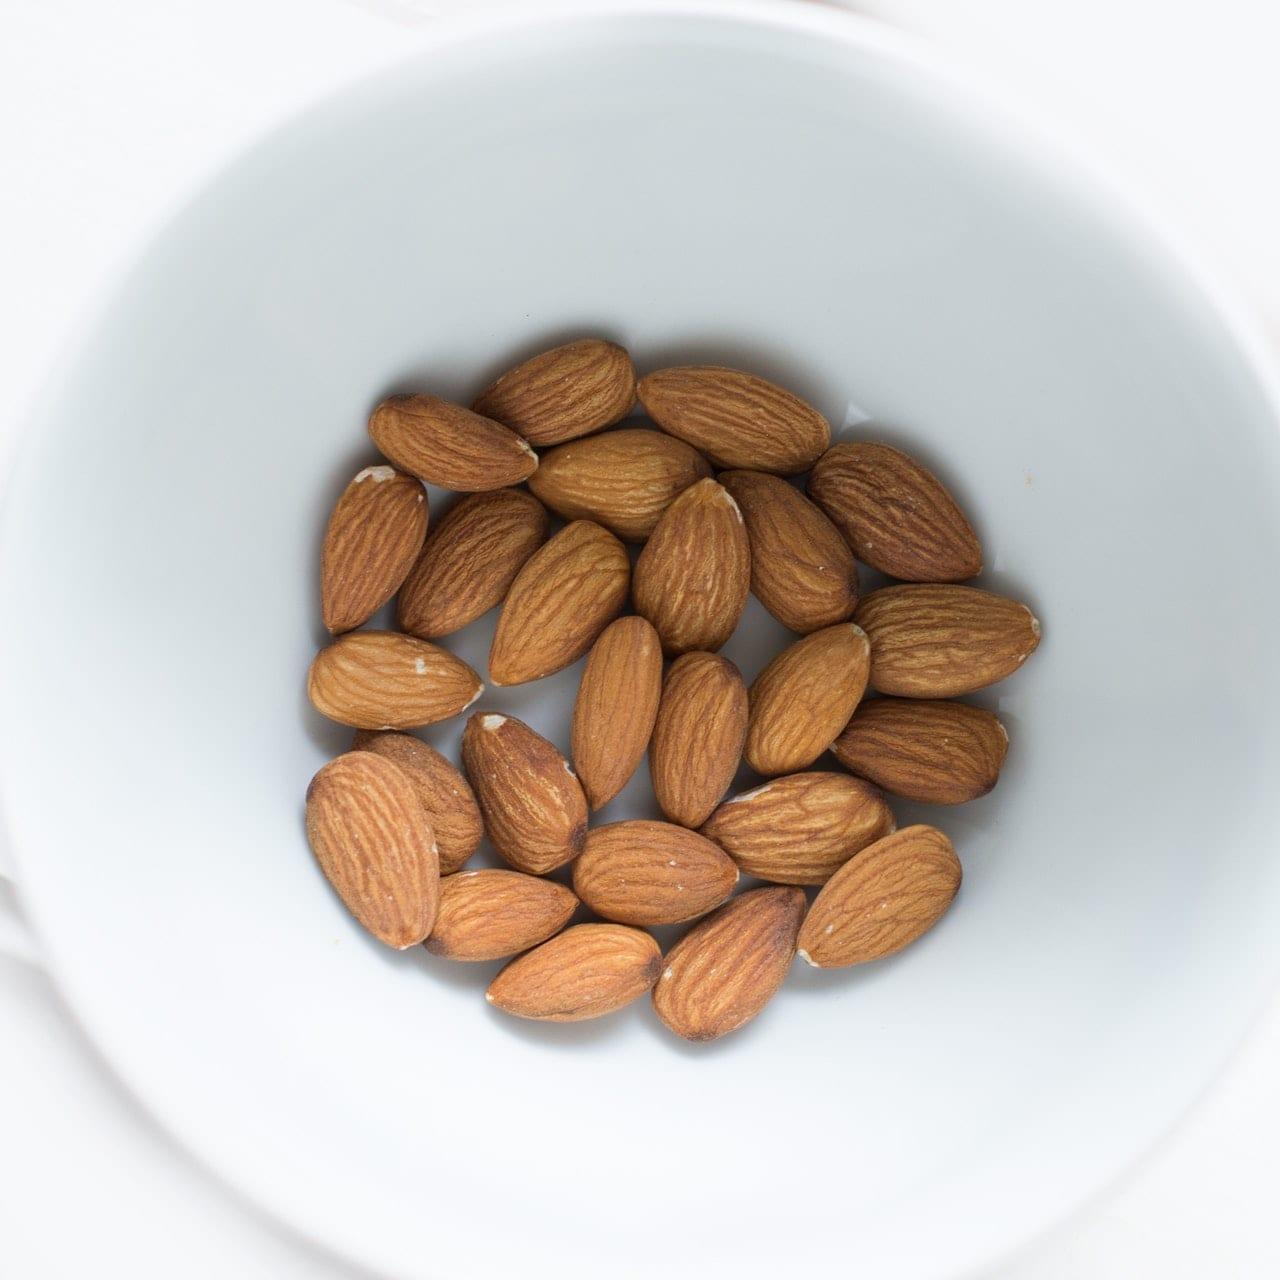 Sunde fedtsyrer i nødder